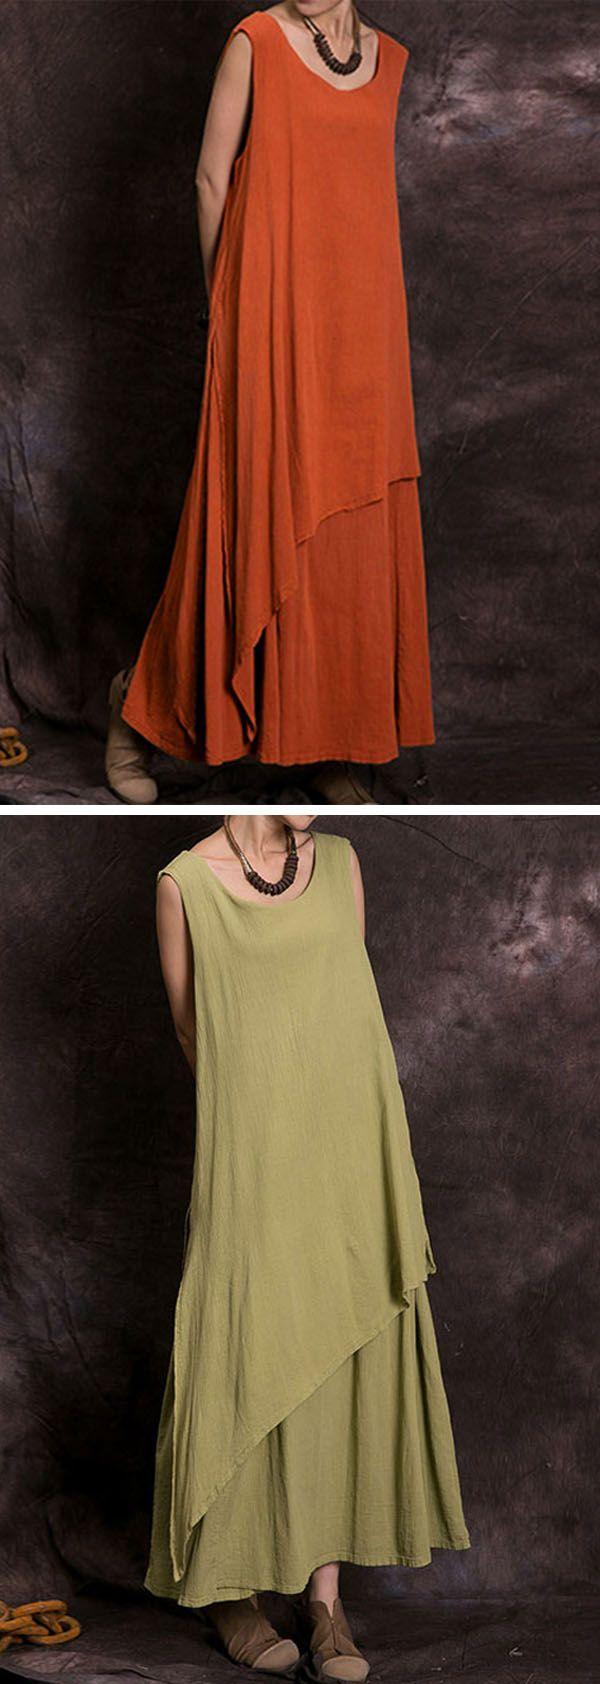 US$20.73 Gracila Vintage Layered Irregular Sleeveless O-neck Maxi Dress For Women